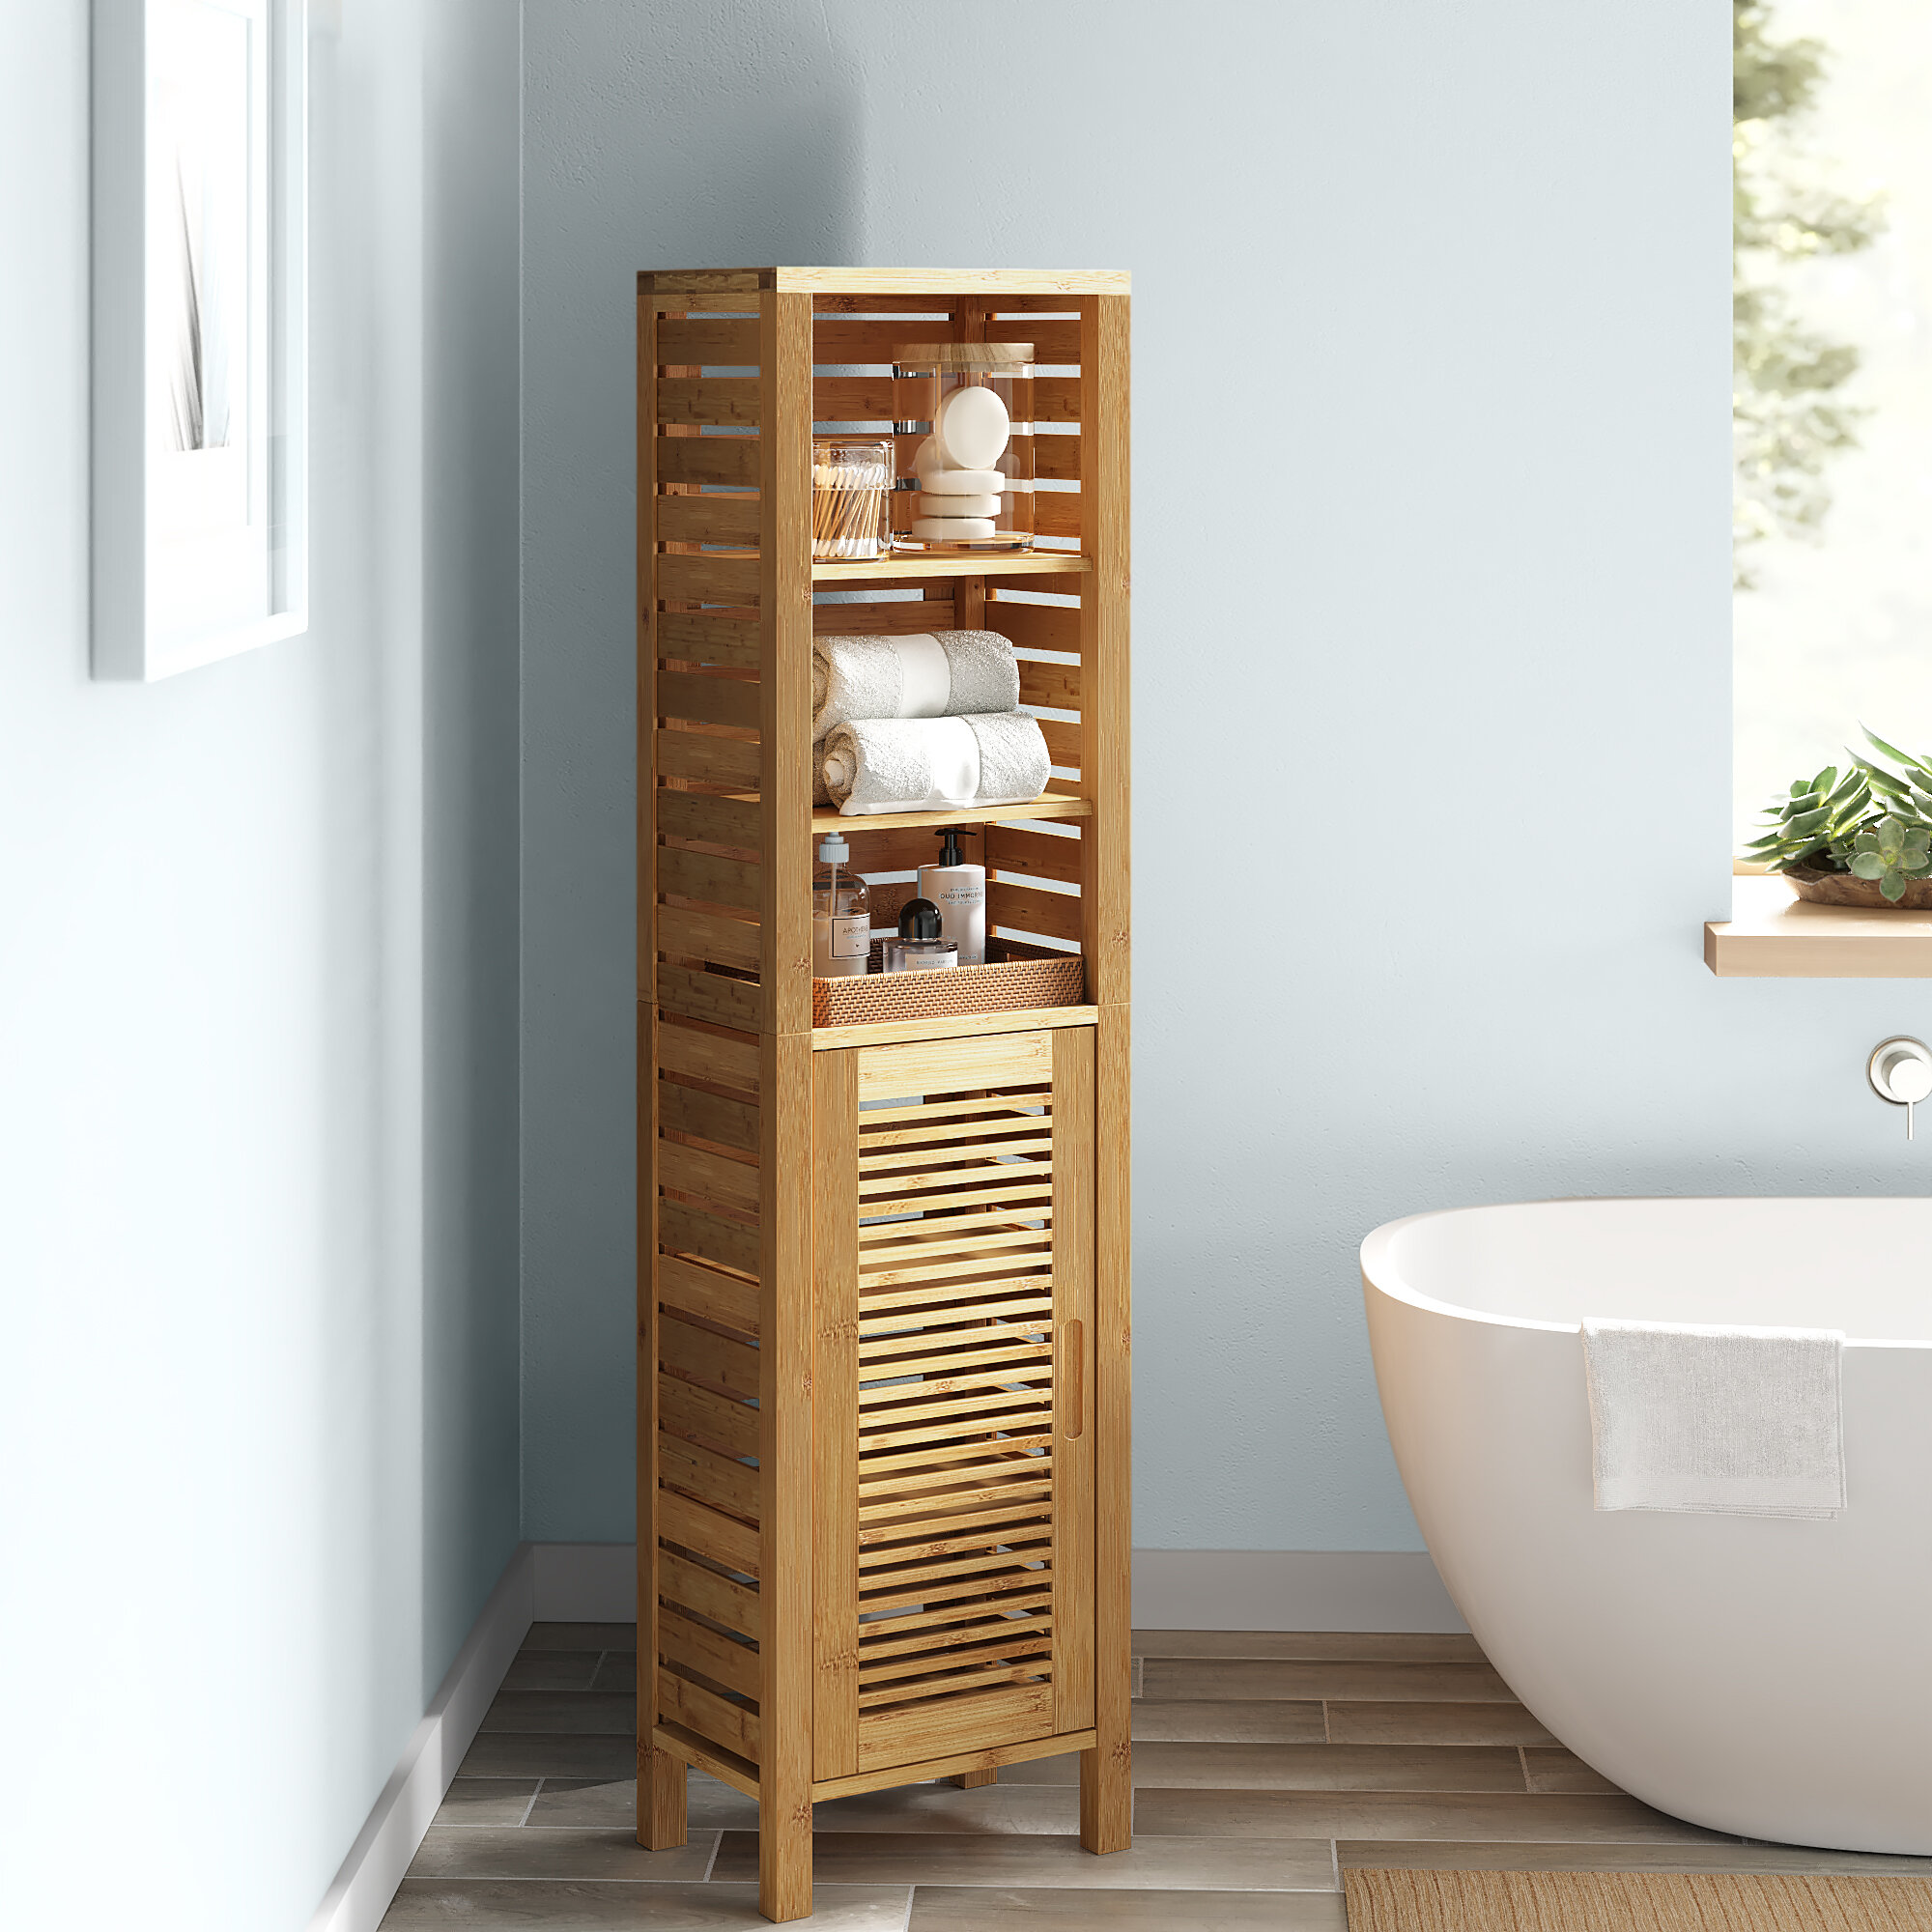 Bamboo Bathroom Cabinets Shelving You Ll Love In 2021 Wayfair